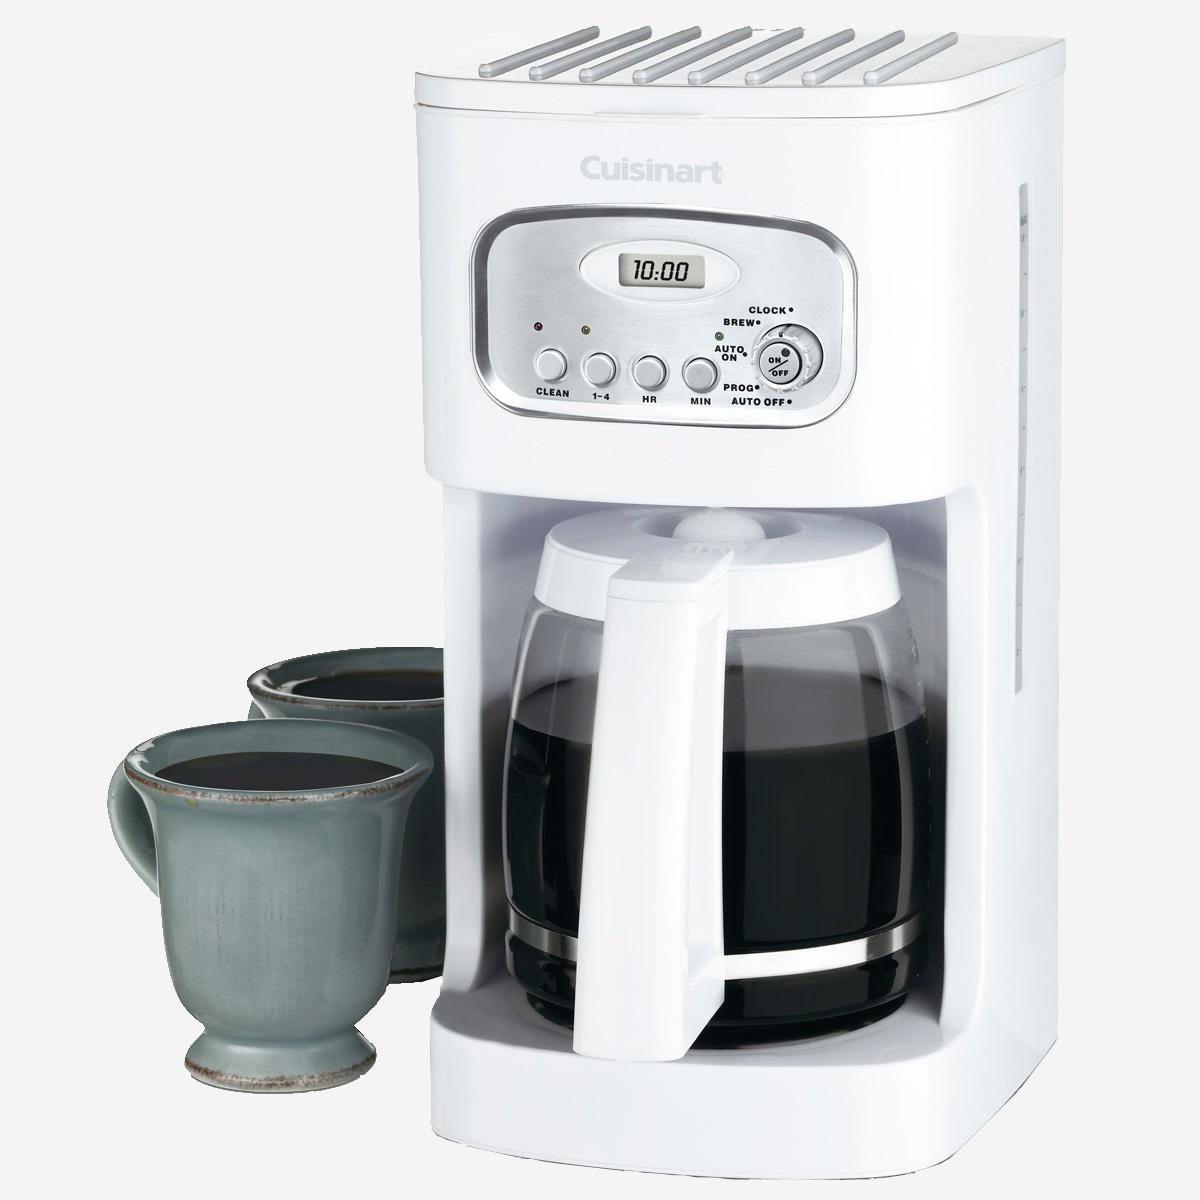 DCC 1100C Cuisinart Coffee Maker Water Filter